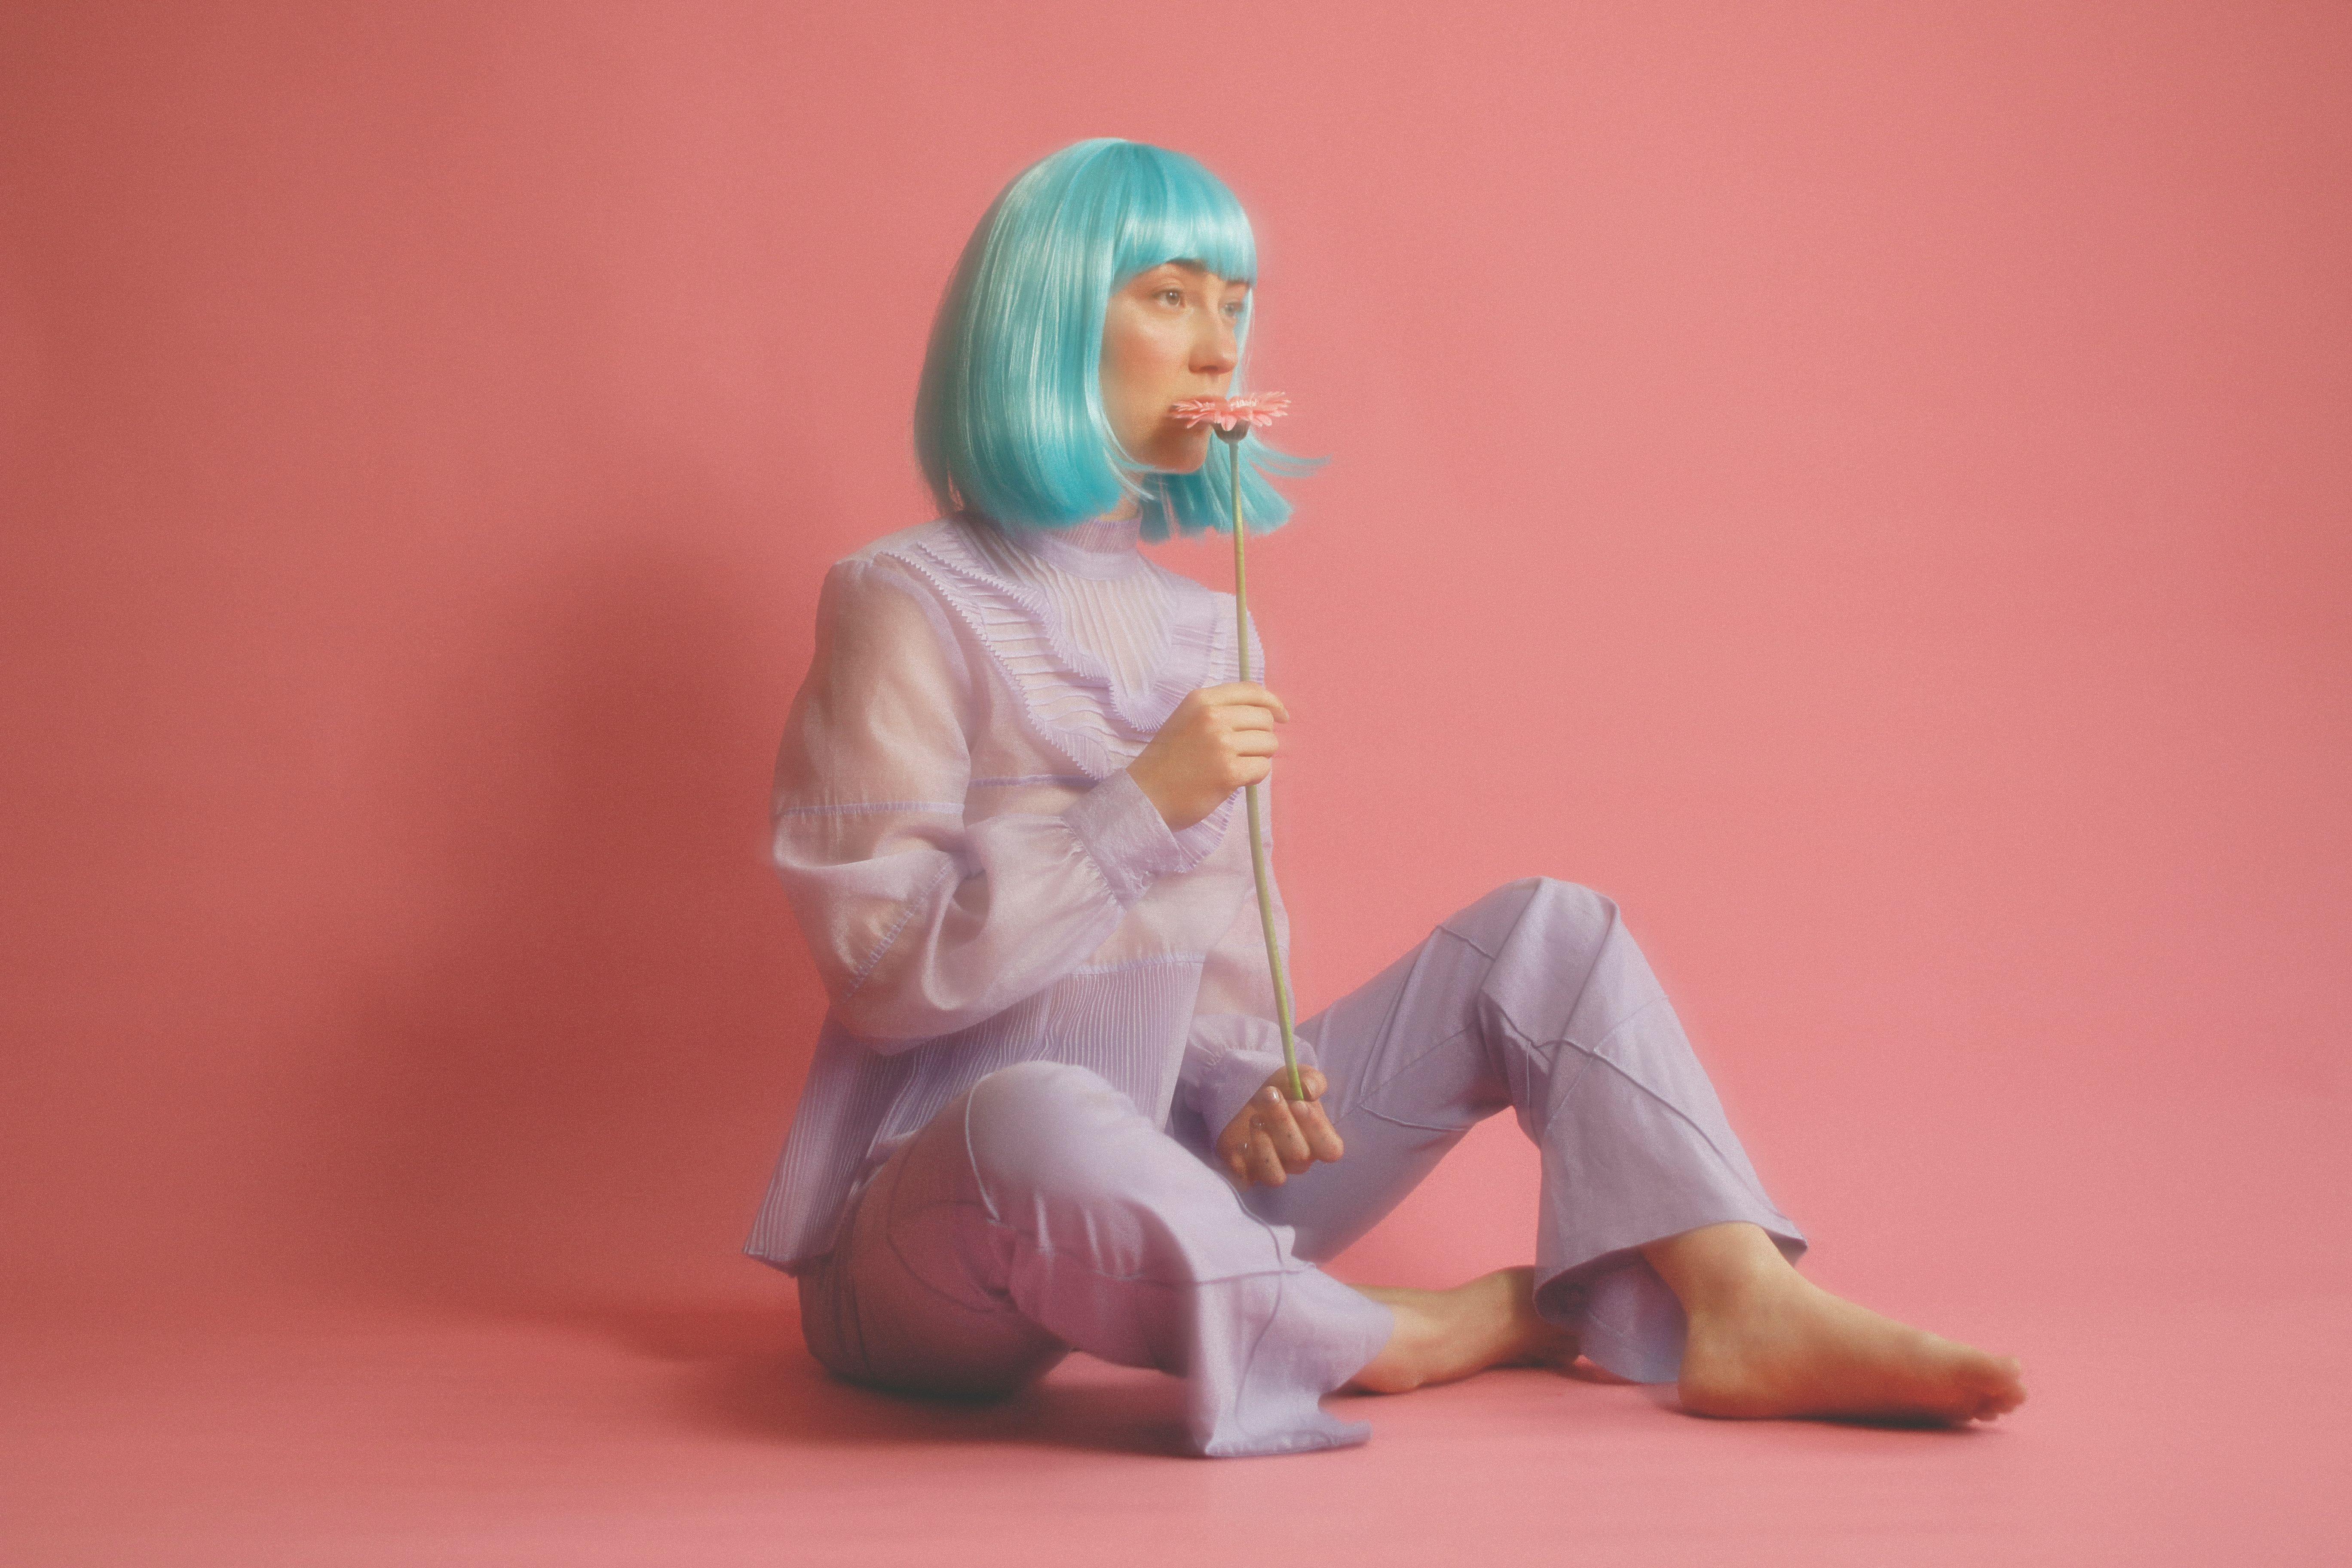 Novaa, She's a Rose, indie, music, picky, pickymagazine